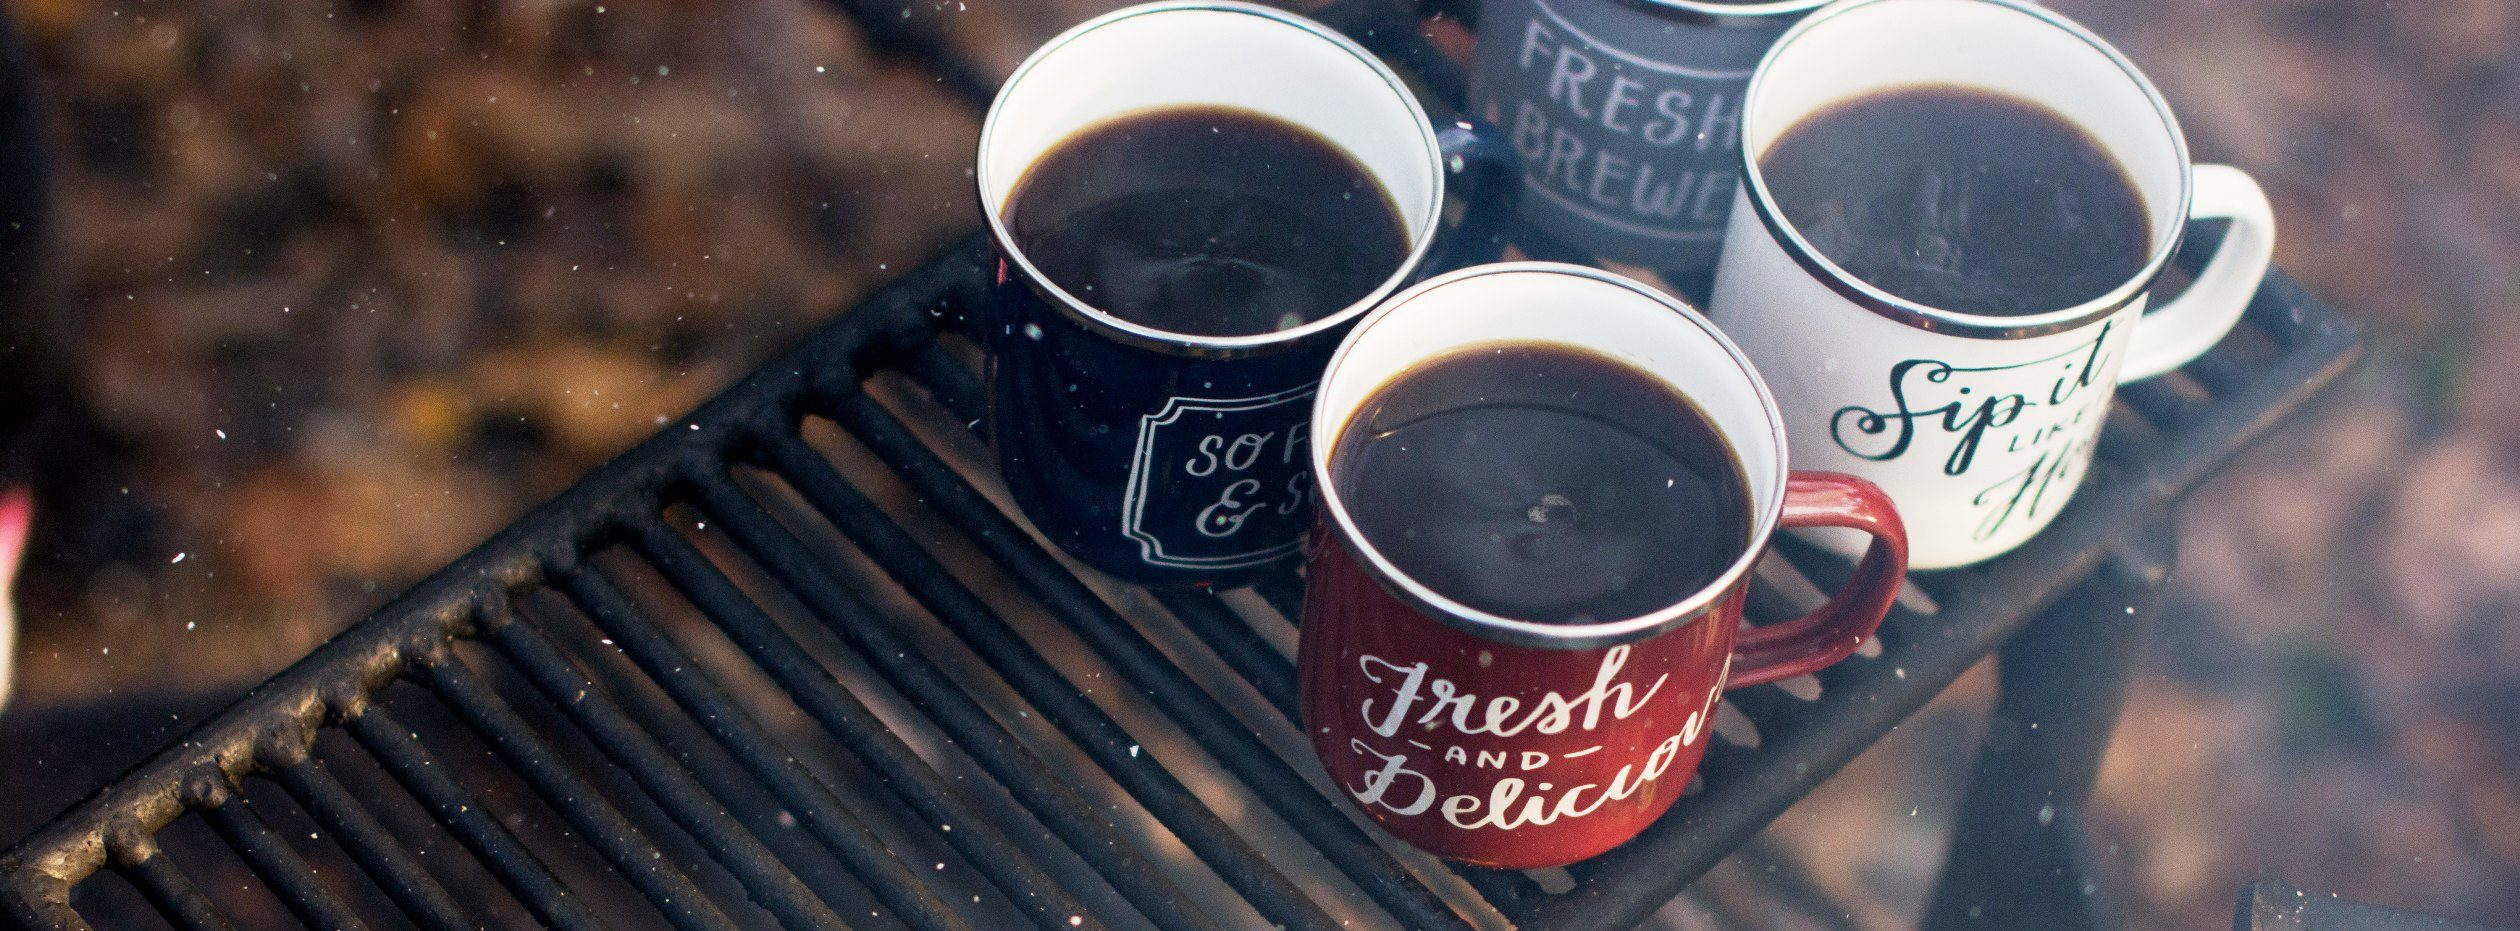 cropped-coffeecups2-24.jpg